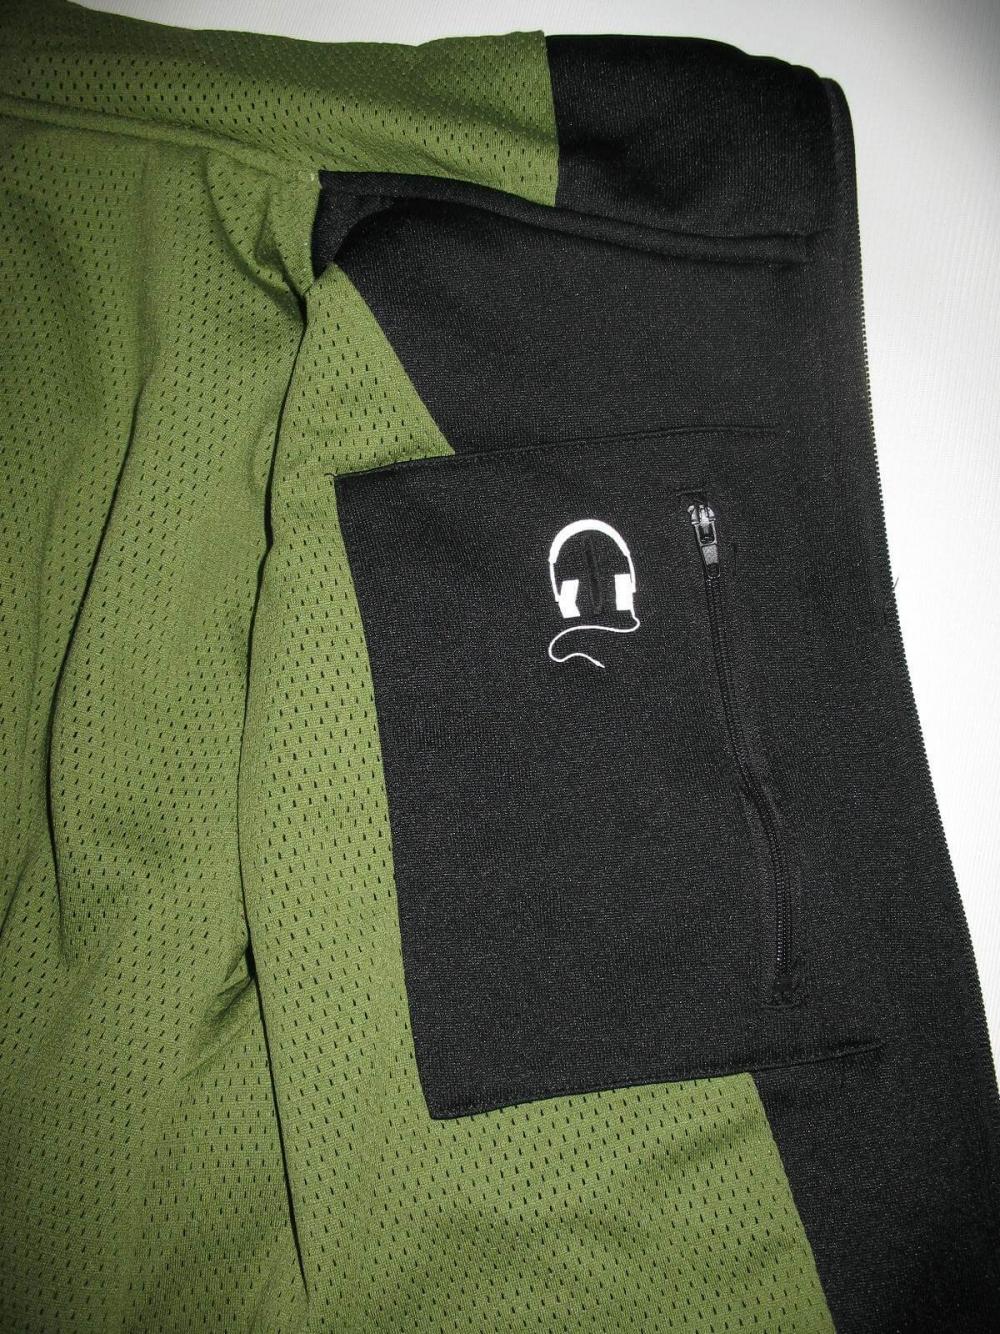 Кофта ARMADA slasher hoodie (размер L) - 9